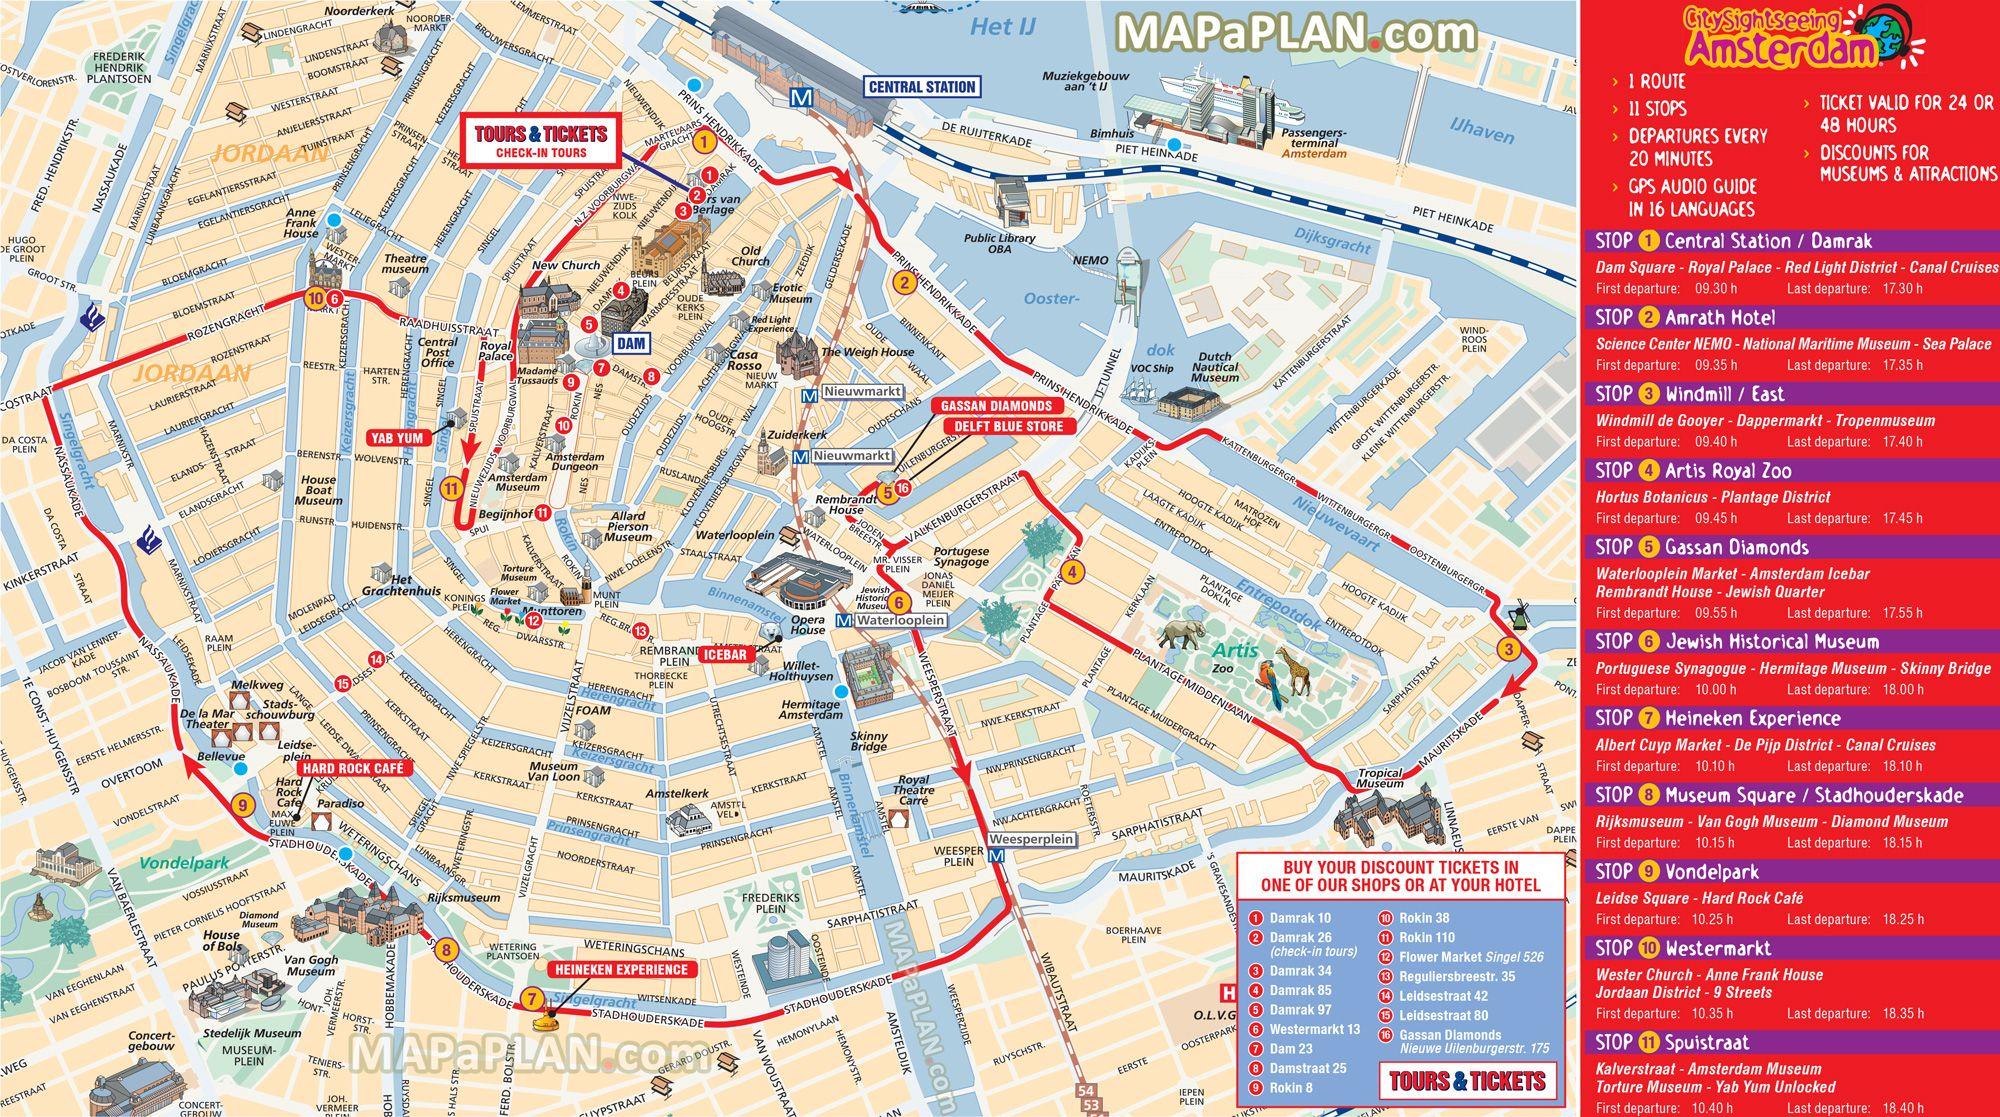 pin anastacia riz amsterdam amsterdam amsterdam city map. Black Bedroom Furniture Sets. Home Design Ideas